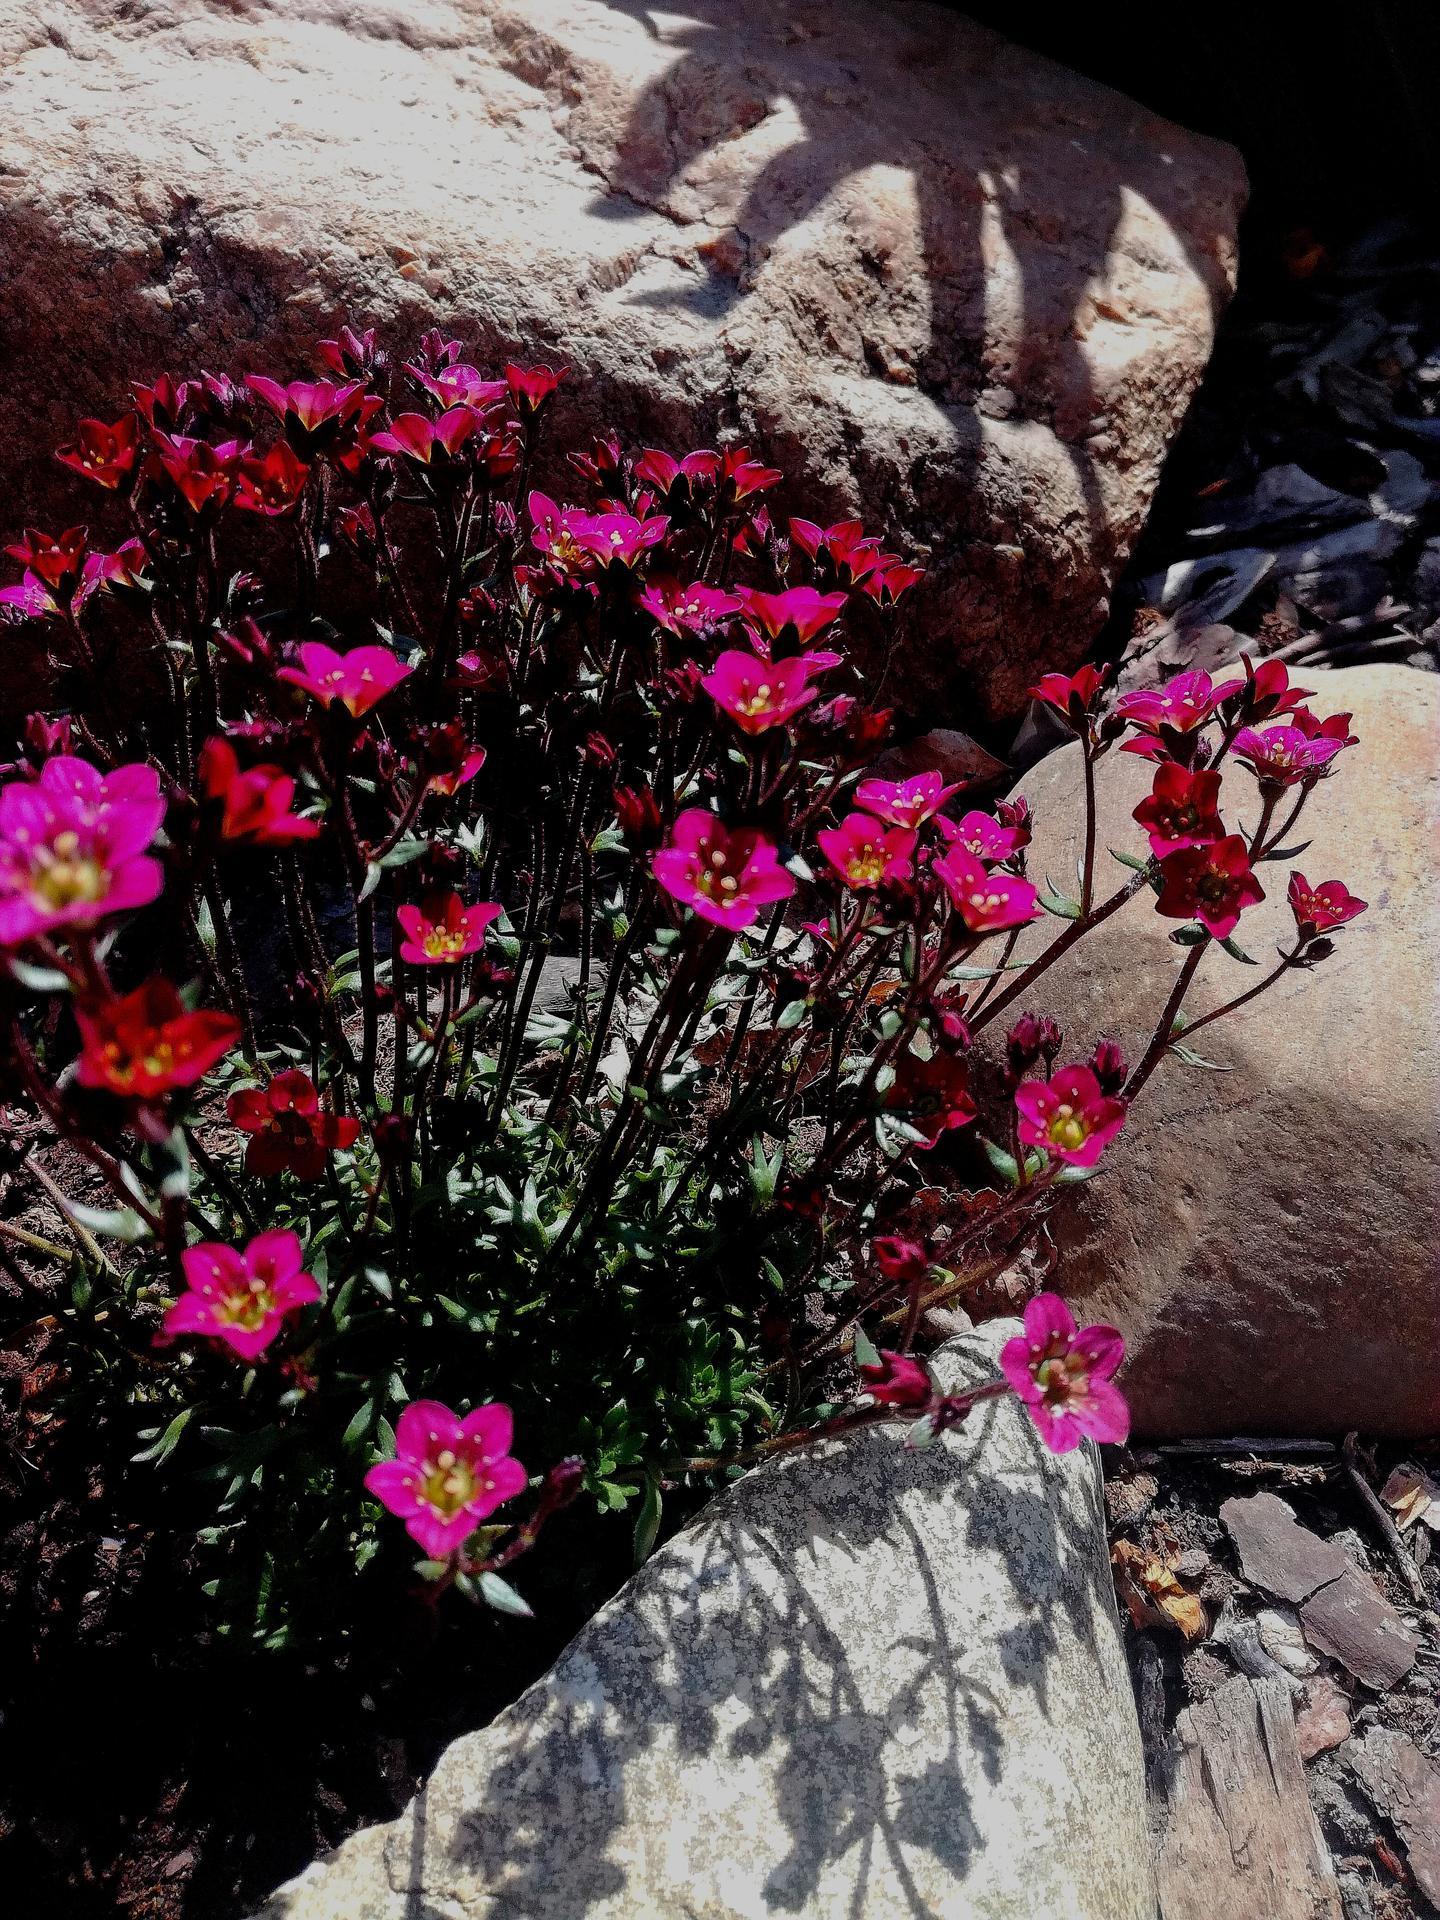 Zahrada 2021 🌲 - Obrázek č. 54